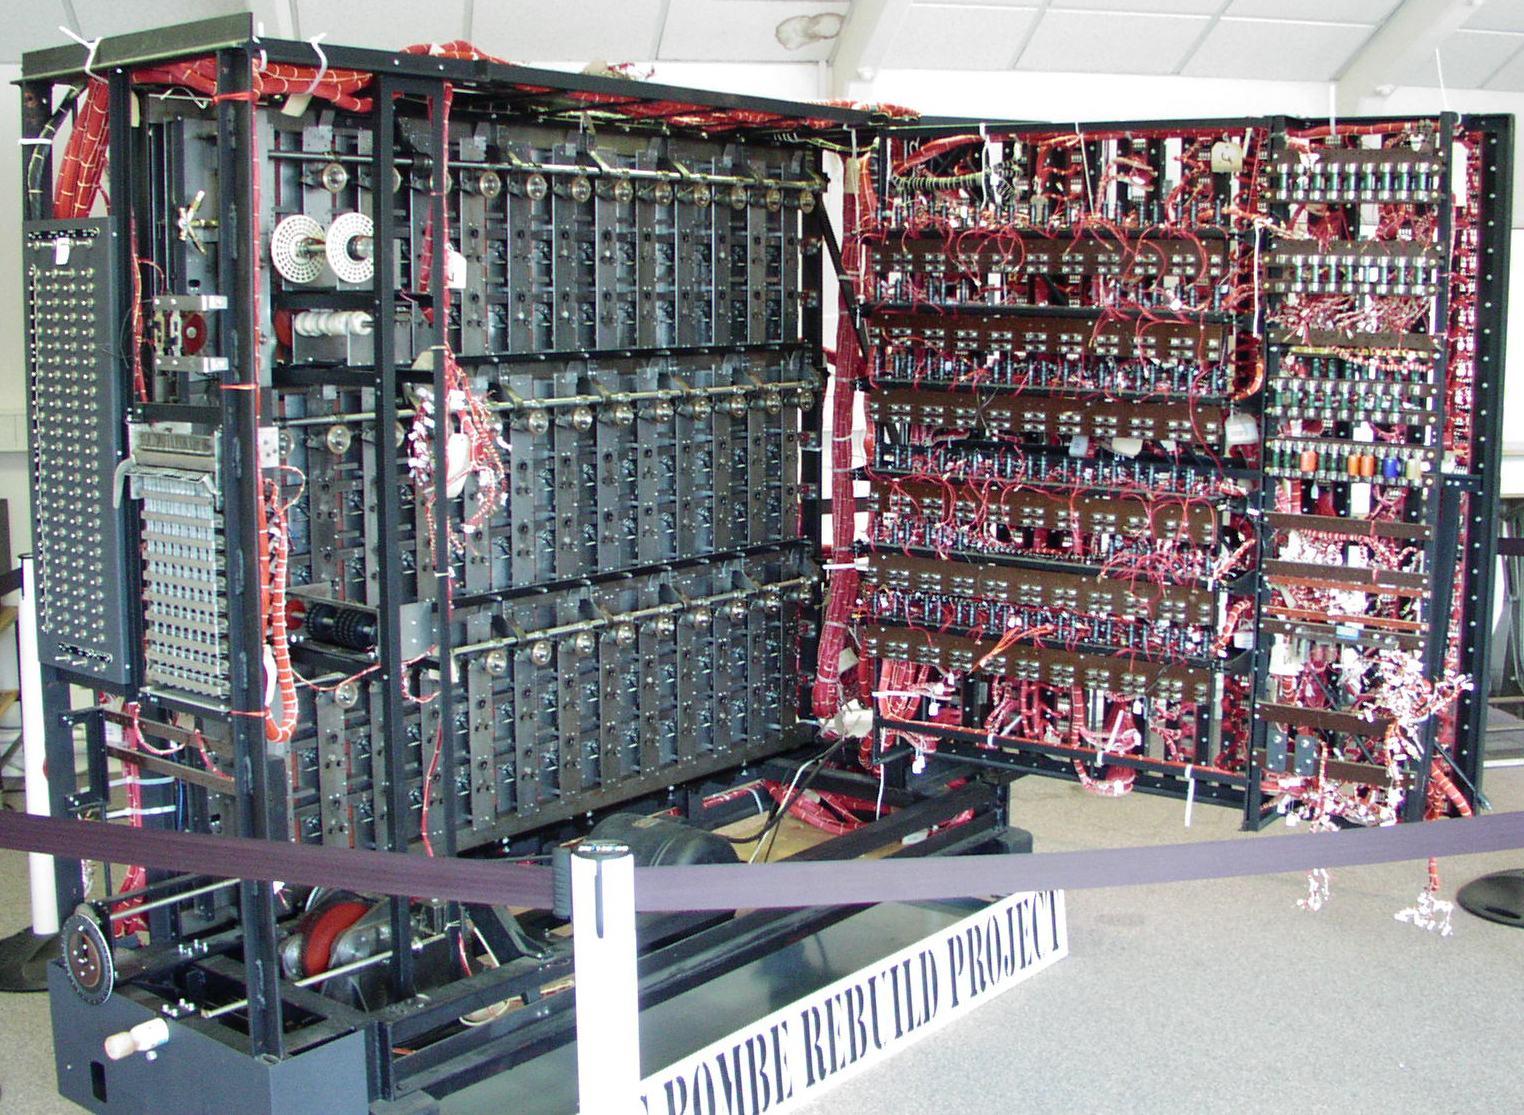 Reconstitution de la bombe de Turing (source, https://upload.wikimedia.org/wikipedia/commons/5/5c/Bombe-rebuild.jpg)